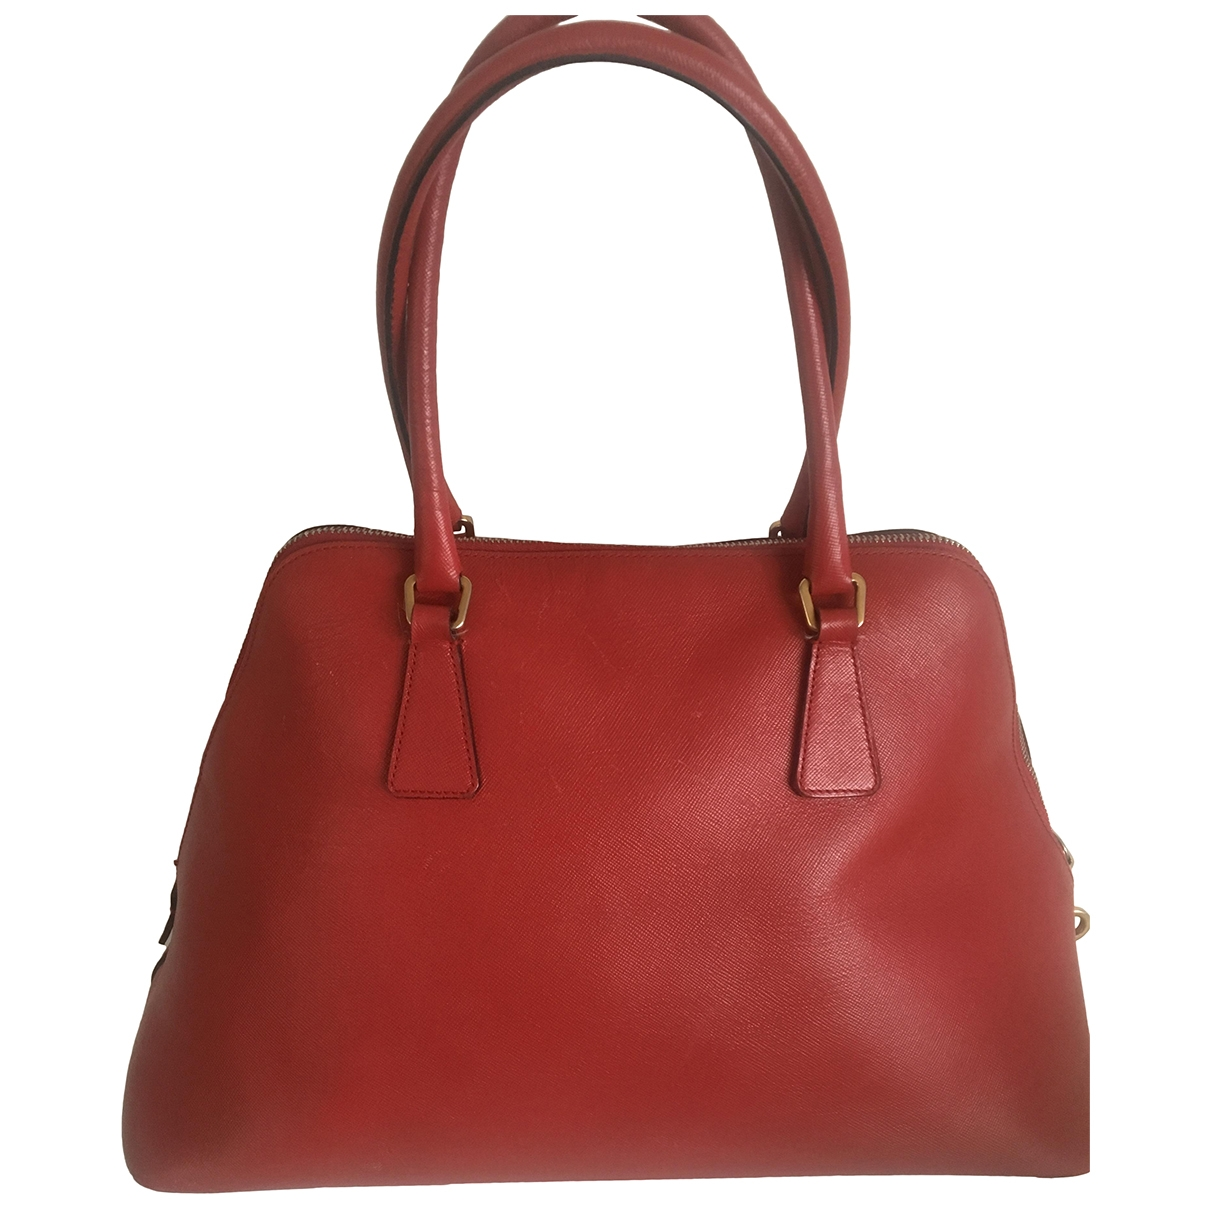 Prada Promenade Handtasche in  Rot Leder